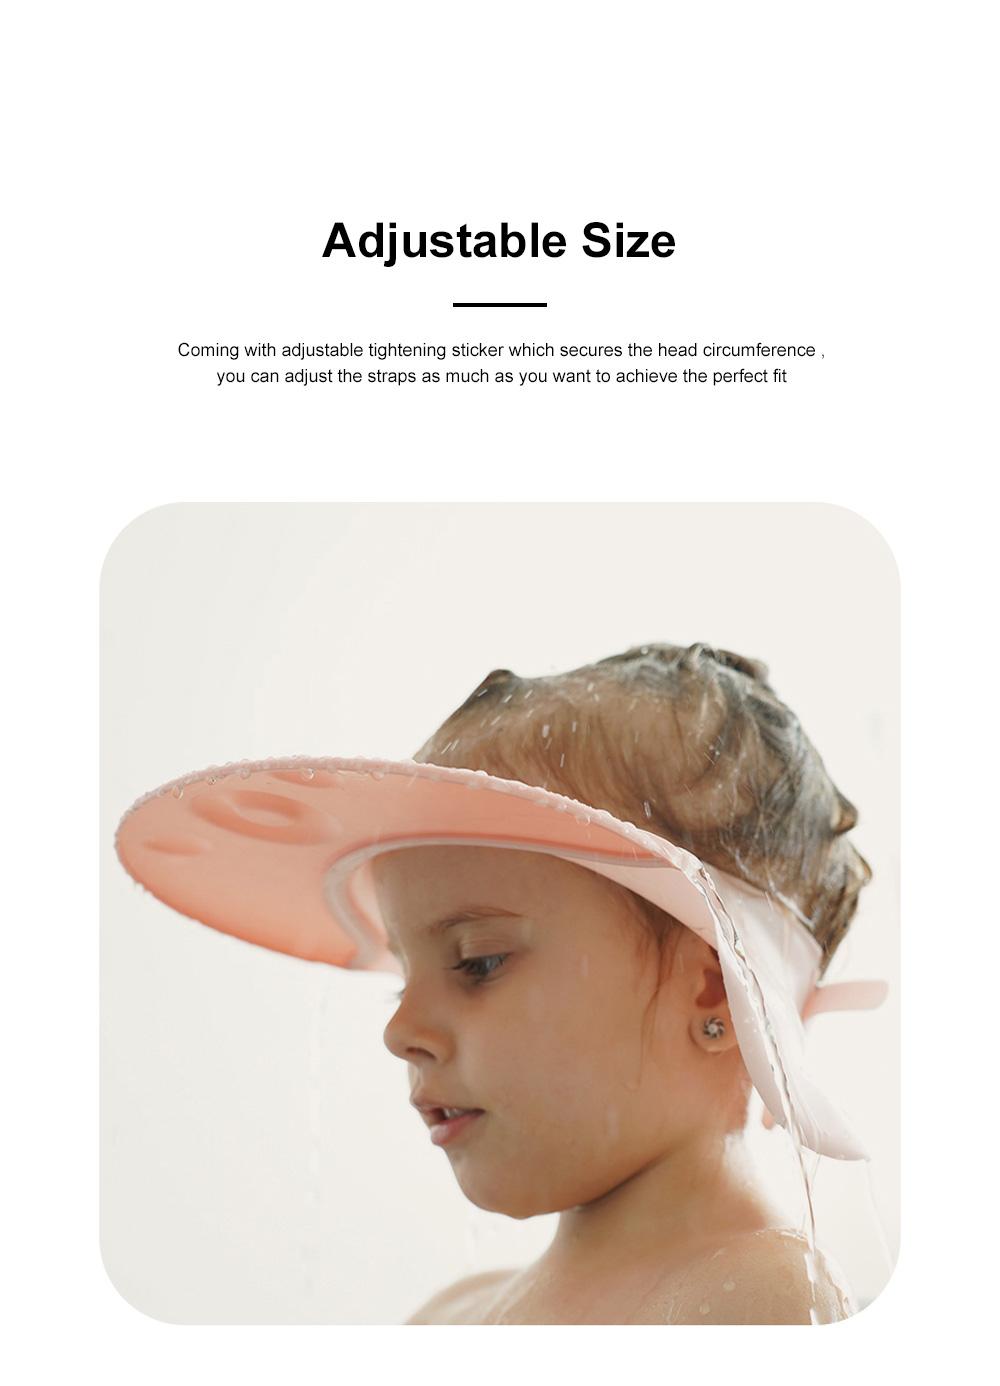 Baby Bathing Cap Shampoo Visor Bathroom Safety Caps with Adjustable Sticker Waterproof & Elastic Octopus Shampoo Hat for Showers, Bathing 1